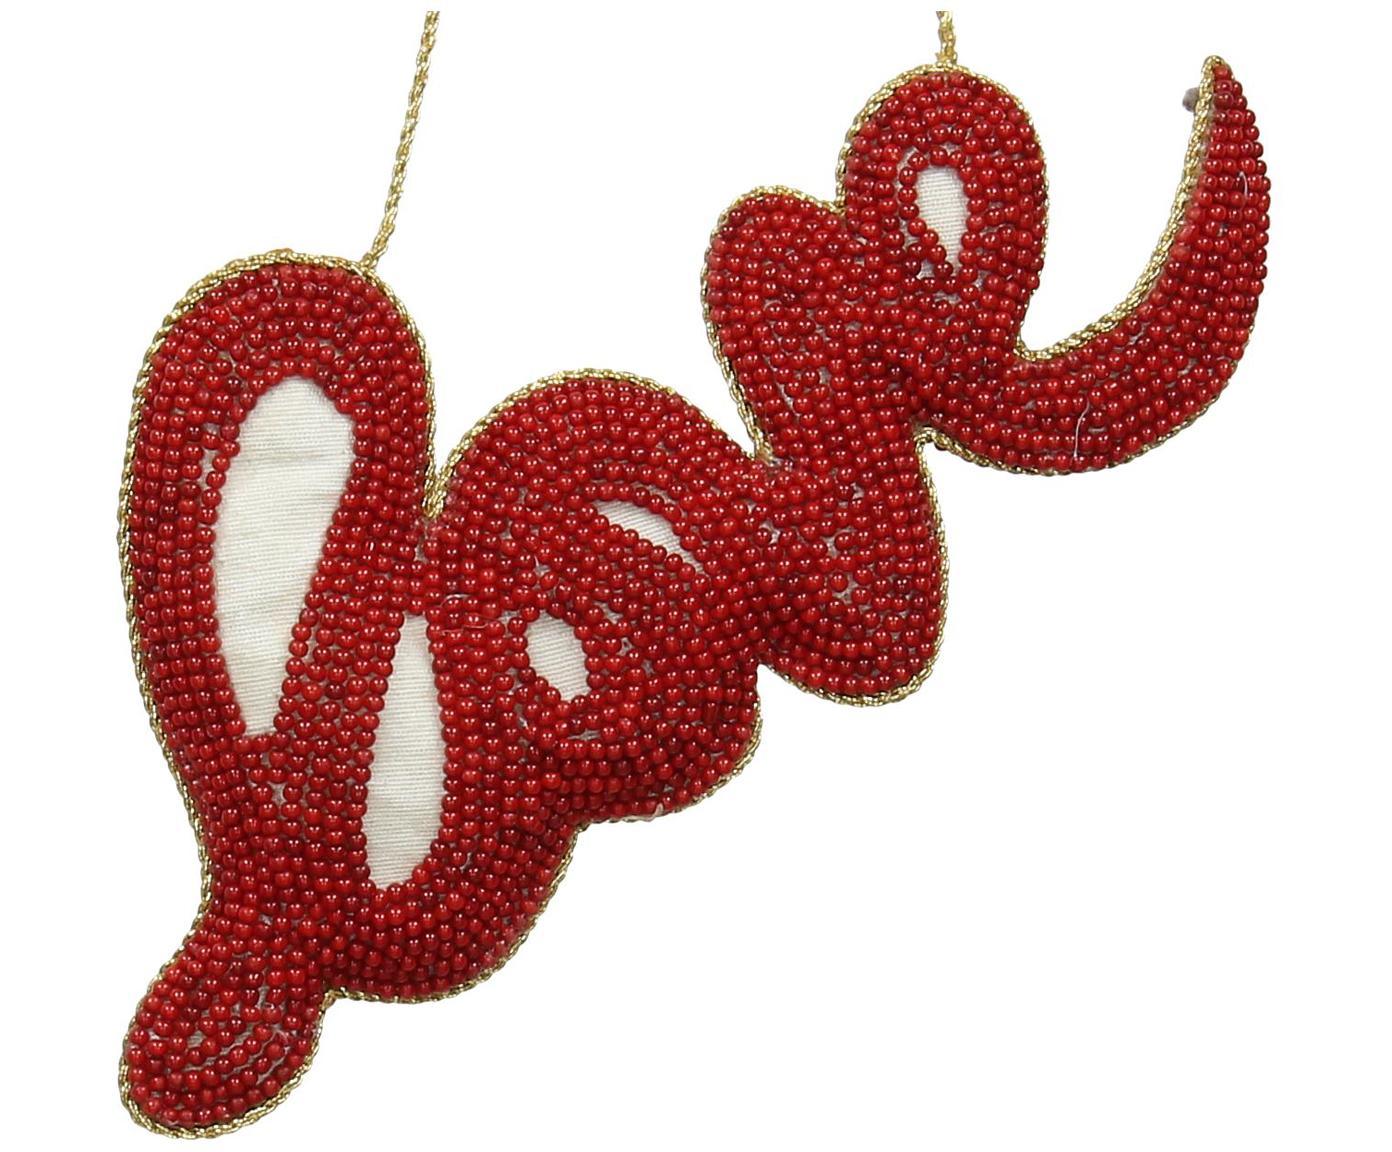 Kerstboomhanger Love, Rood, 16 x 8 cm